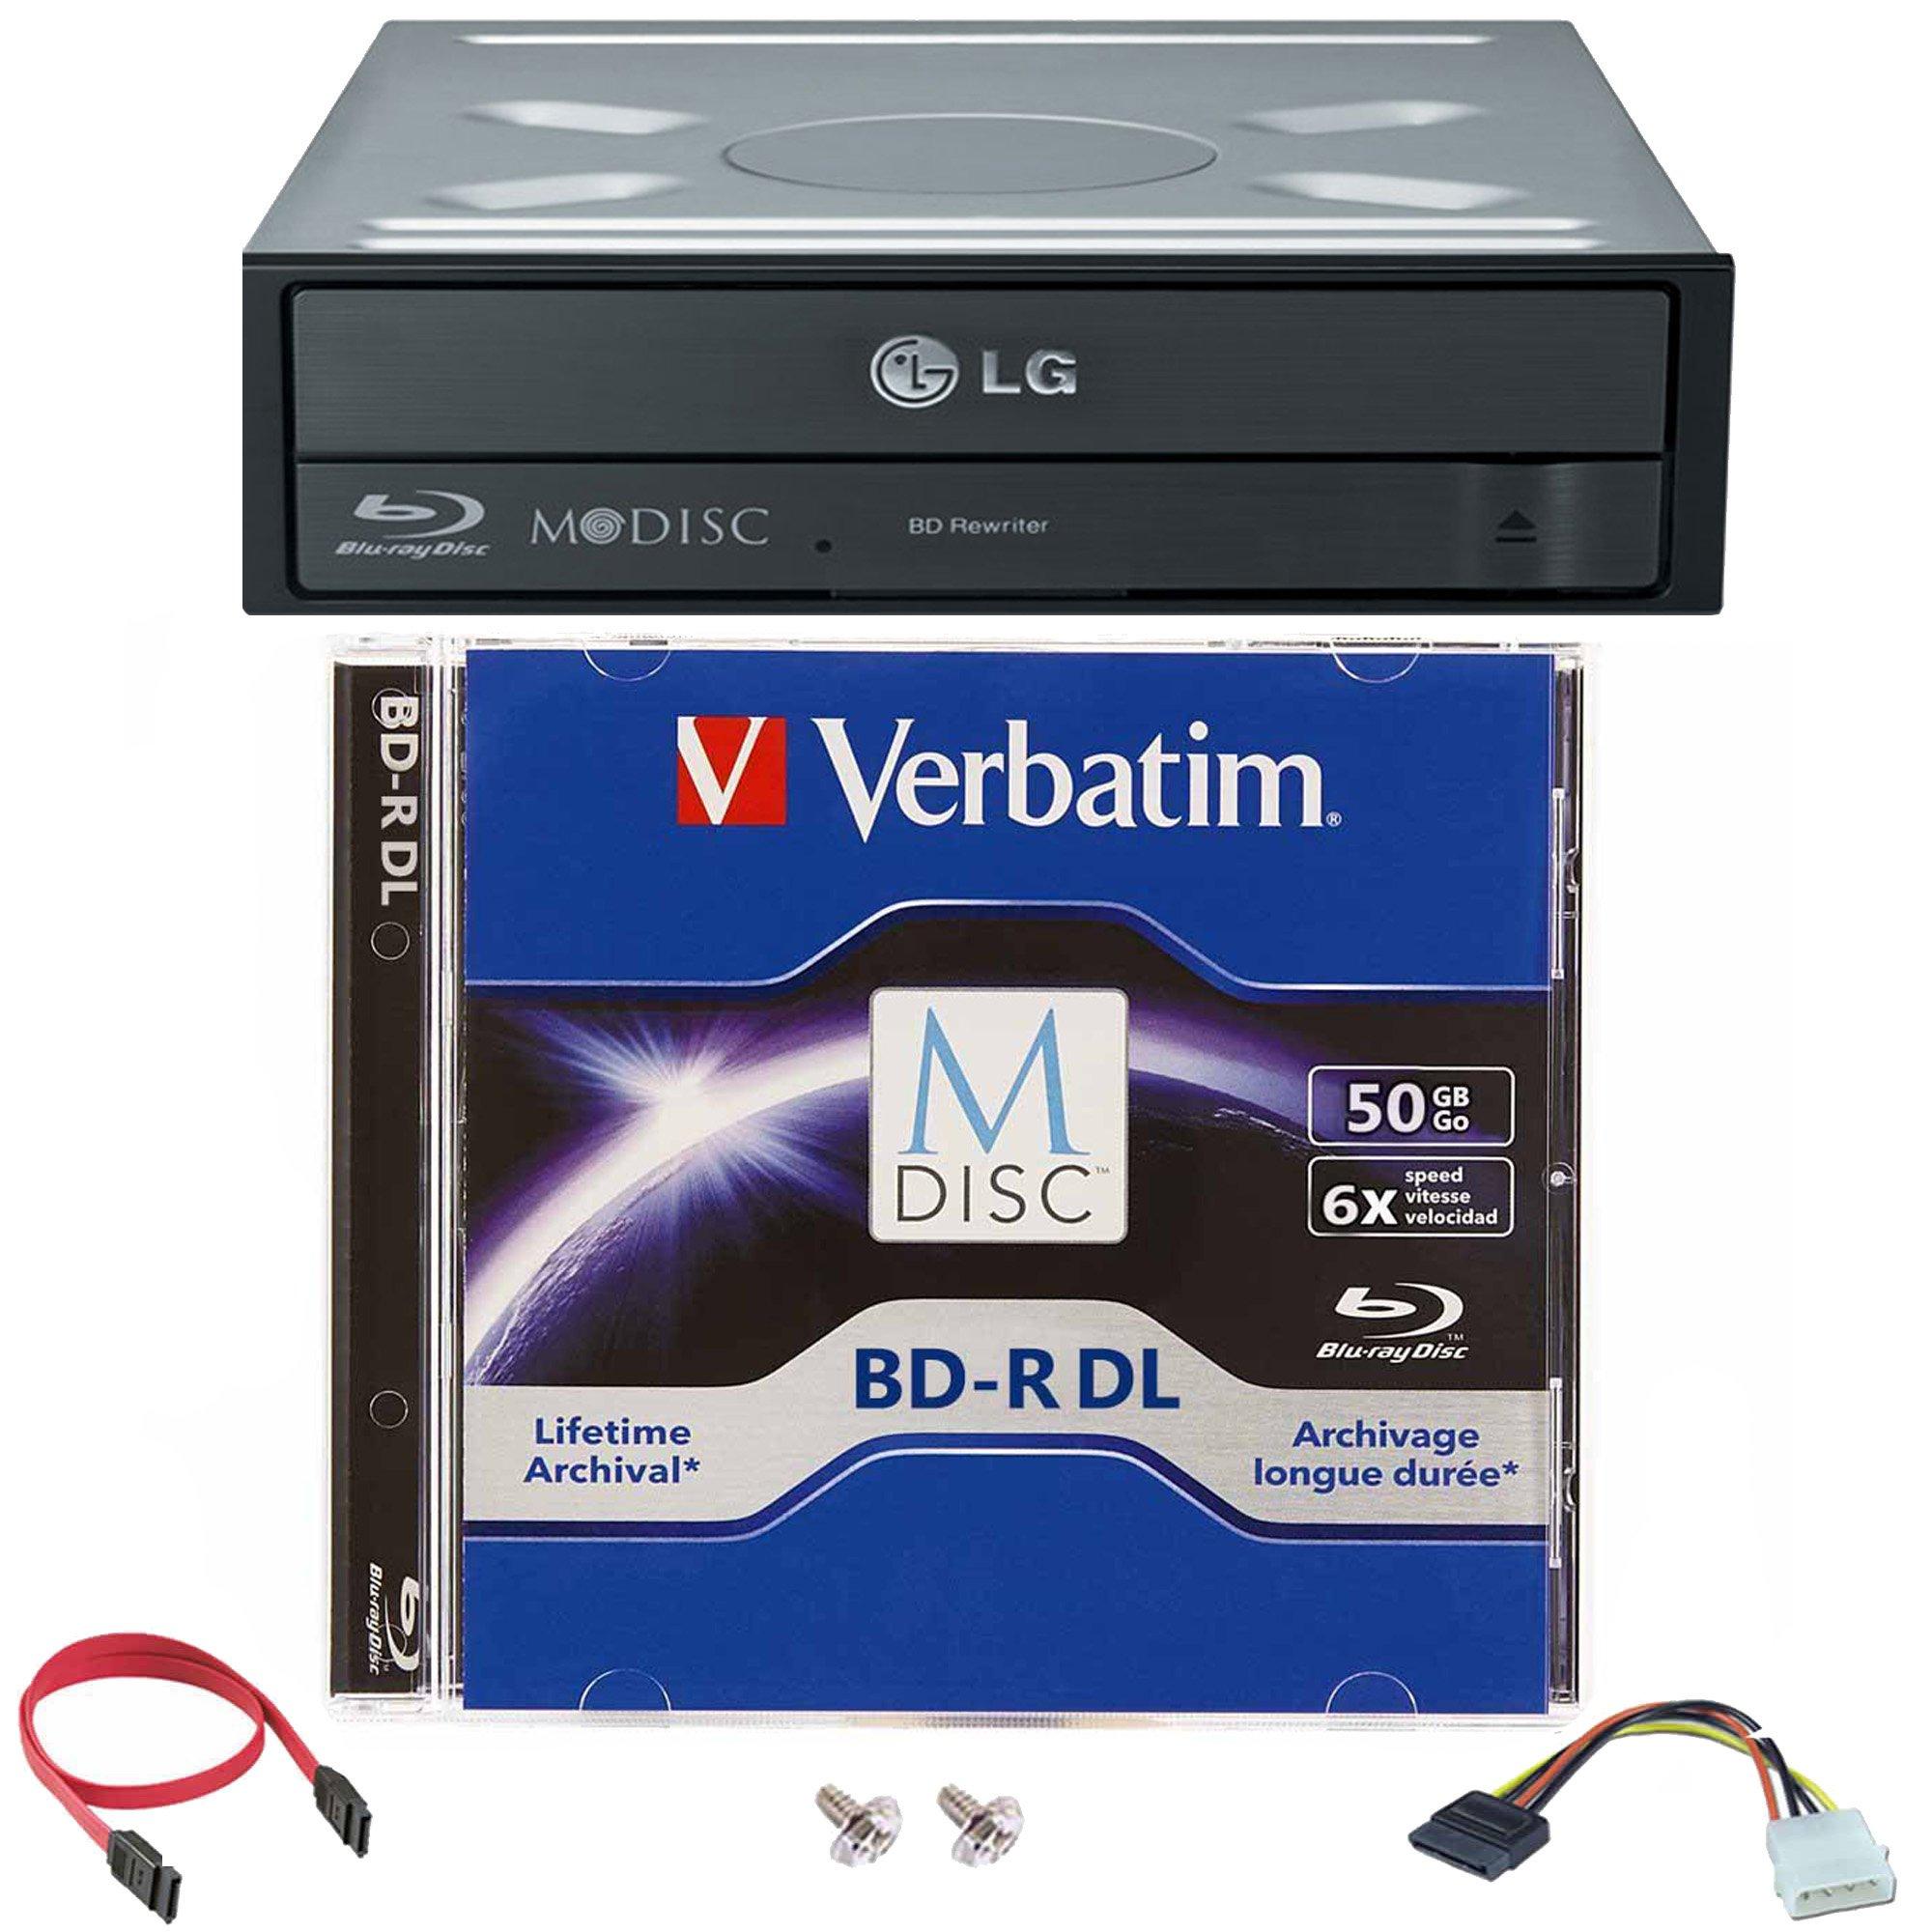 LG WH14NS40 16X Blu-ray BDXL DVD CD Internal Burner Drive Bundle with Free 50GB M-DISC BD-R DL + SATA Cable + Mounting Screws